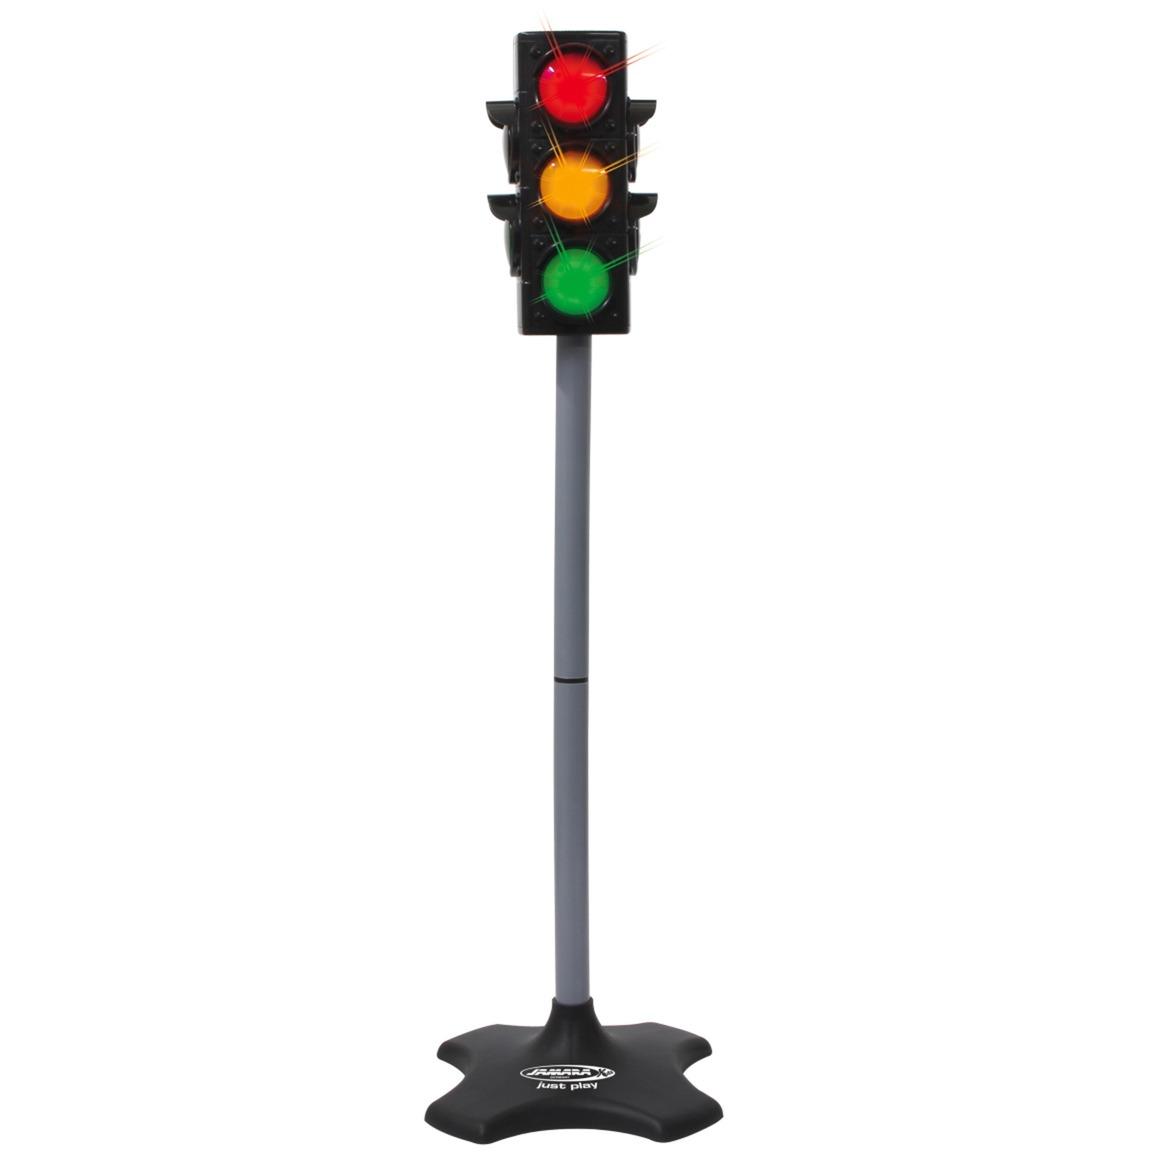 460256 accesorio para juguete de montarse Semáforo de juguete, Señal de tráfico